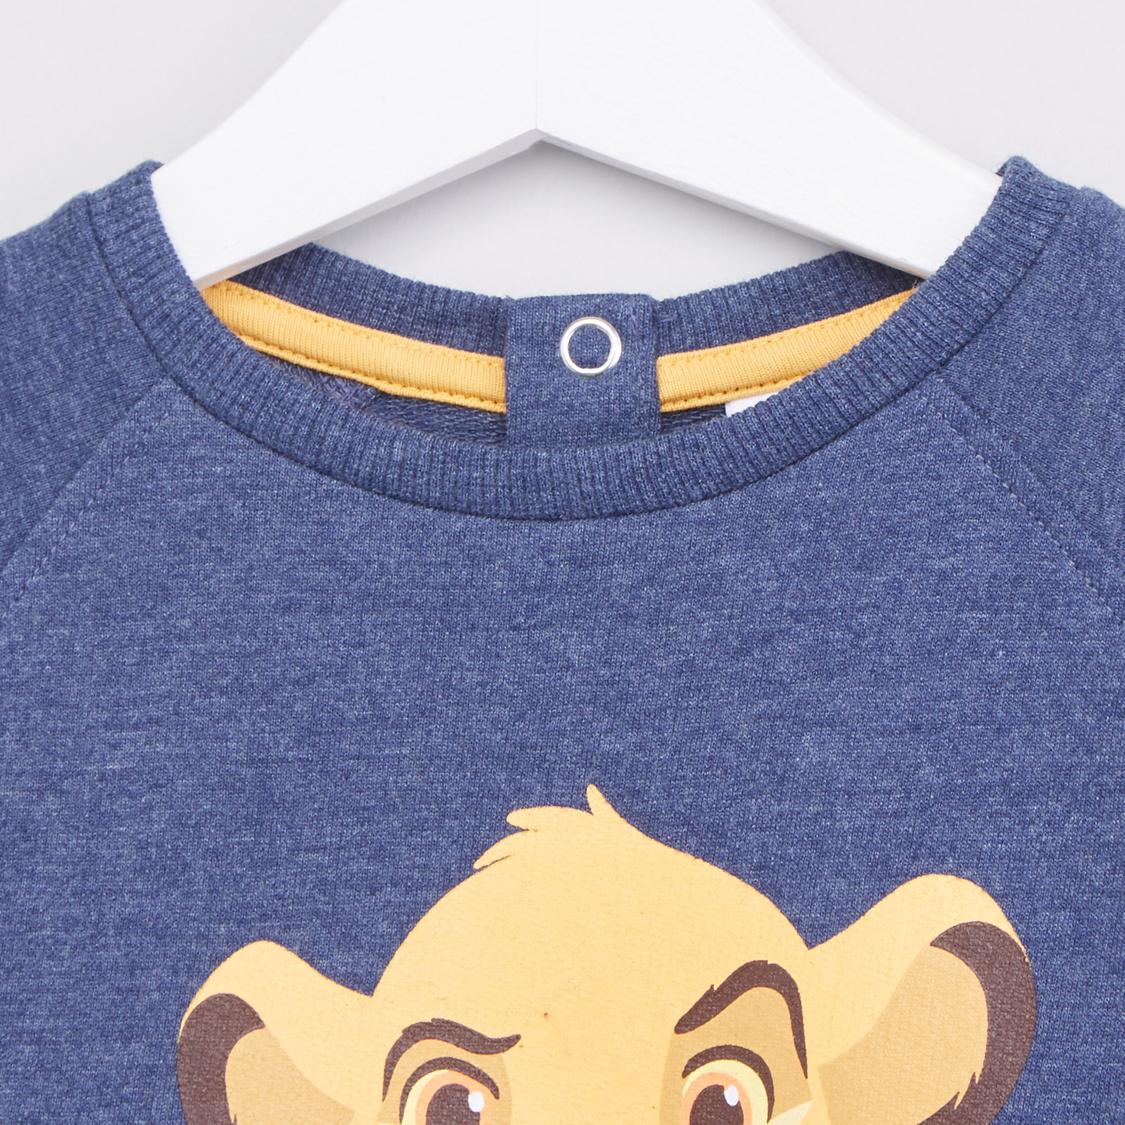 Lion King Printed Sweatshirt with Ribbed Hems